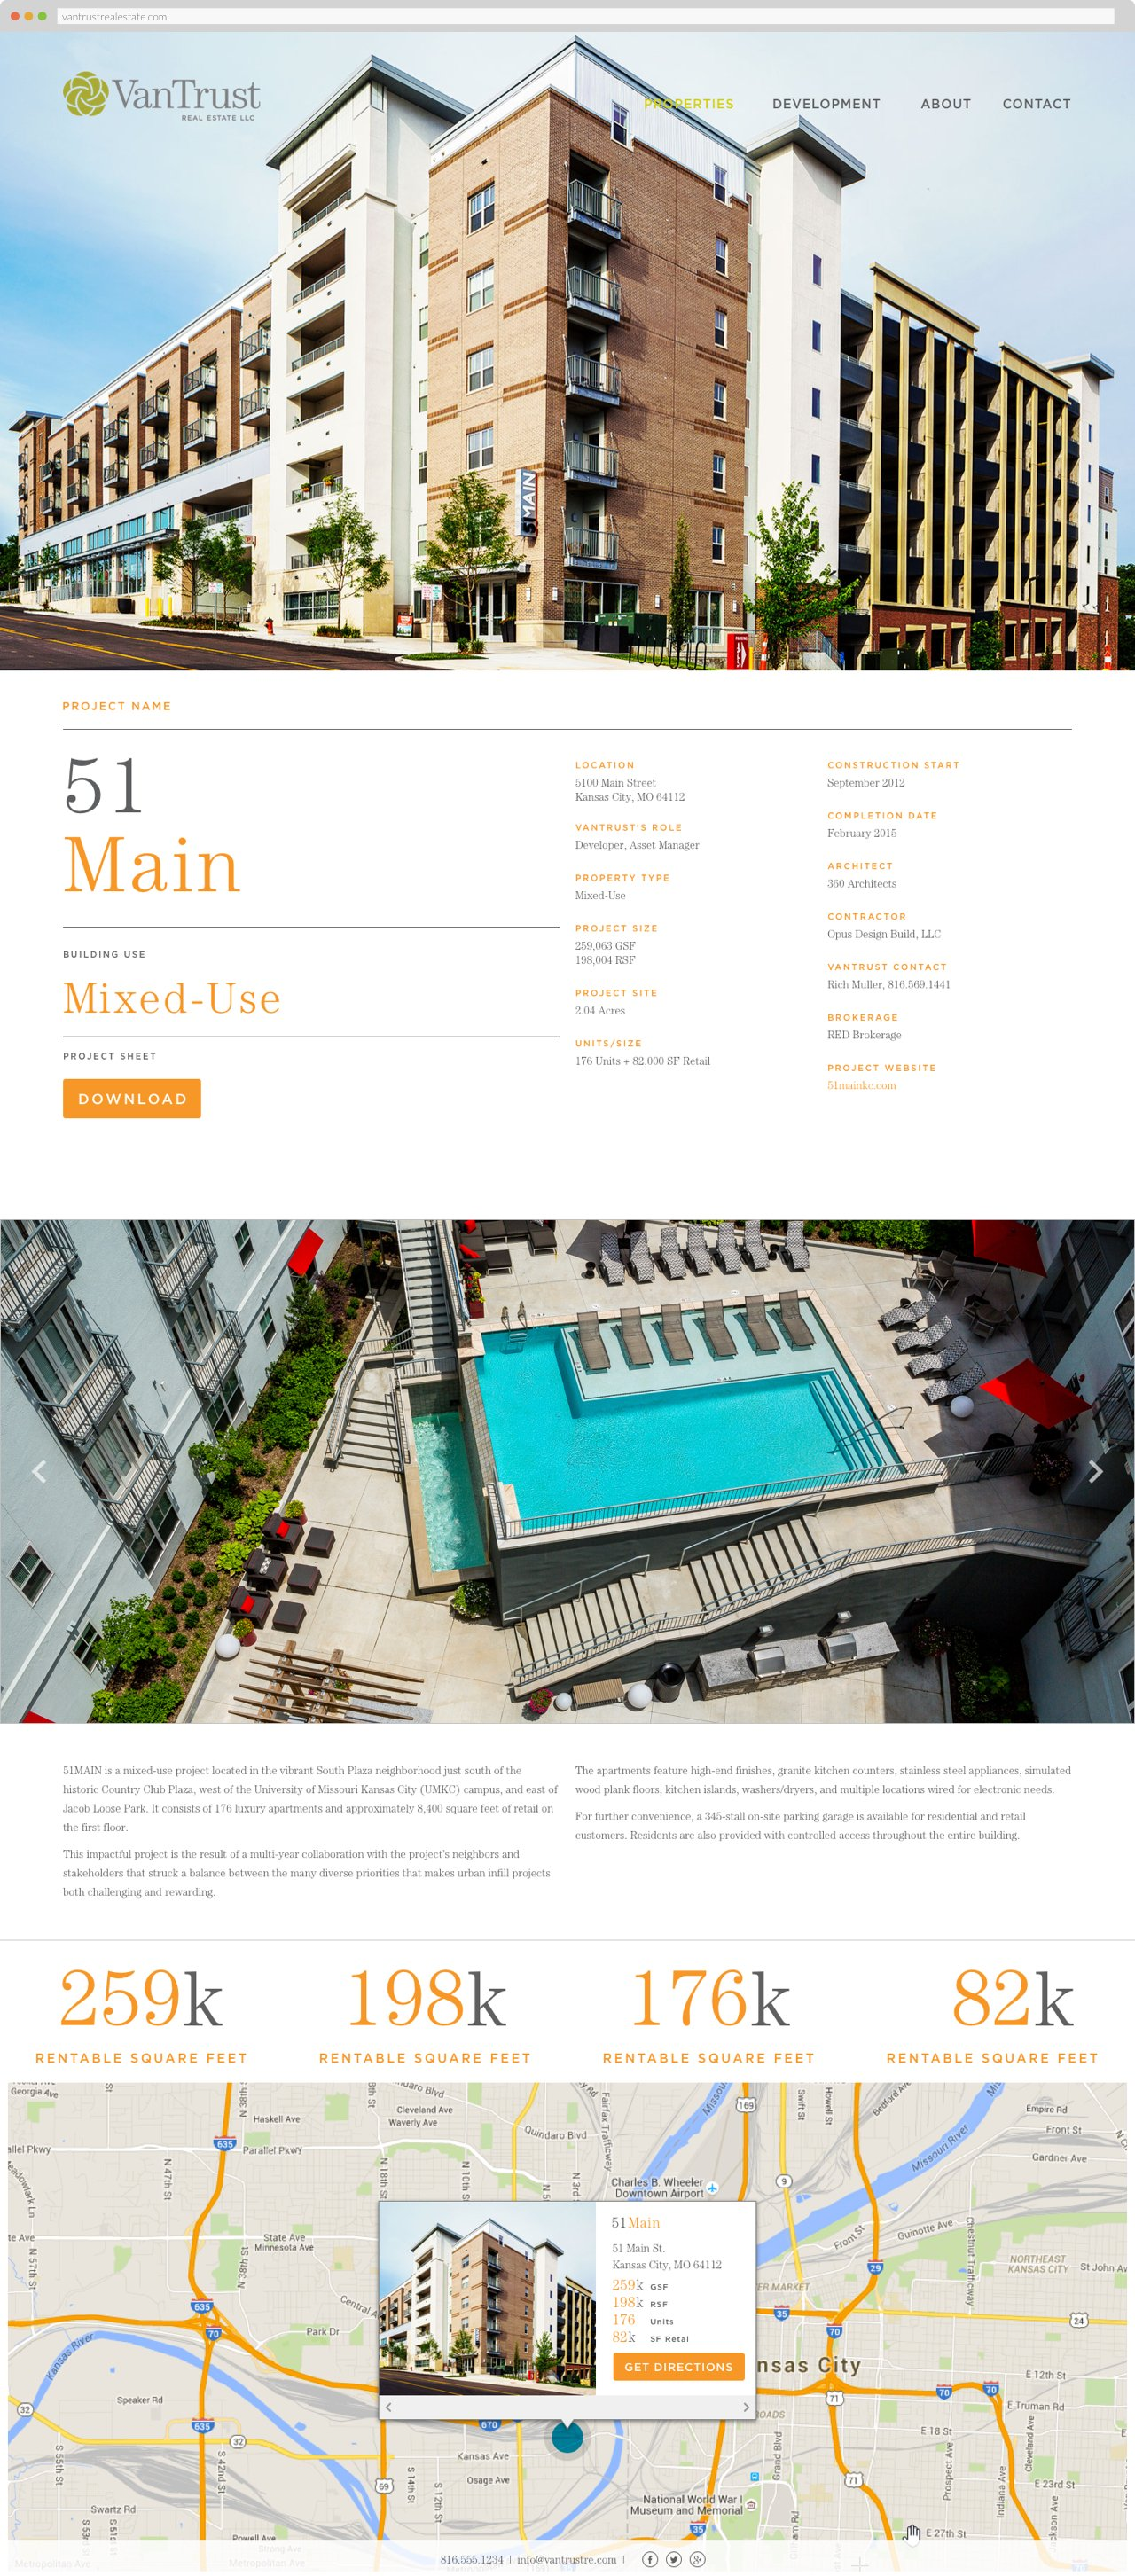 VanTrust Real Estate - Property Profile